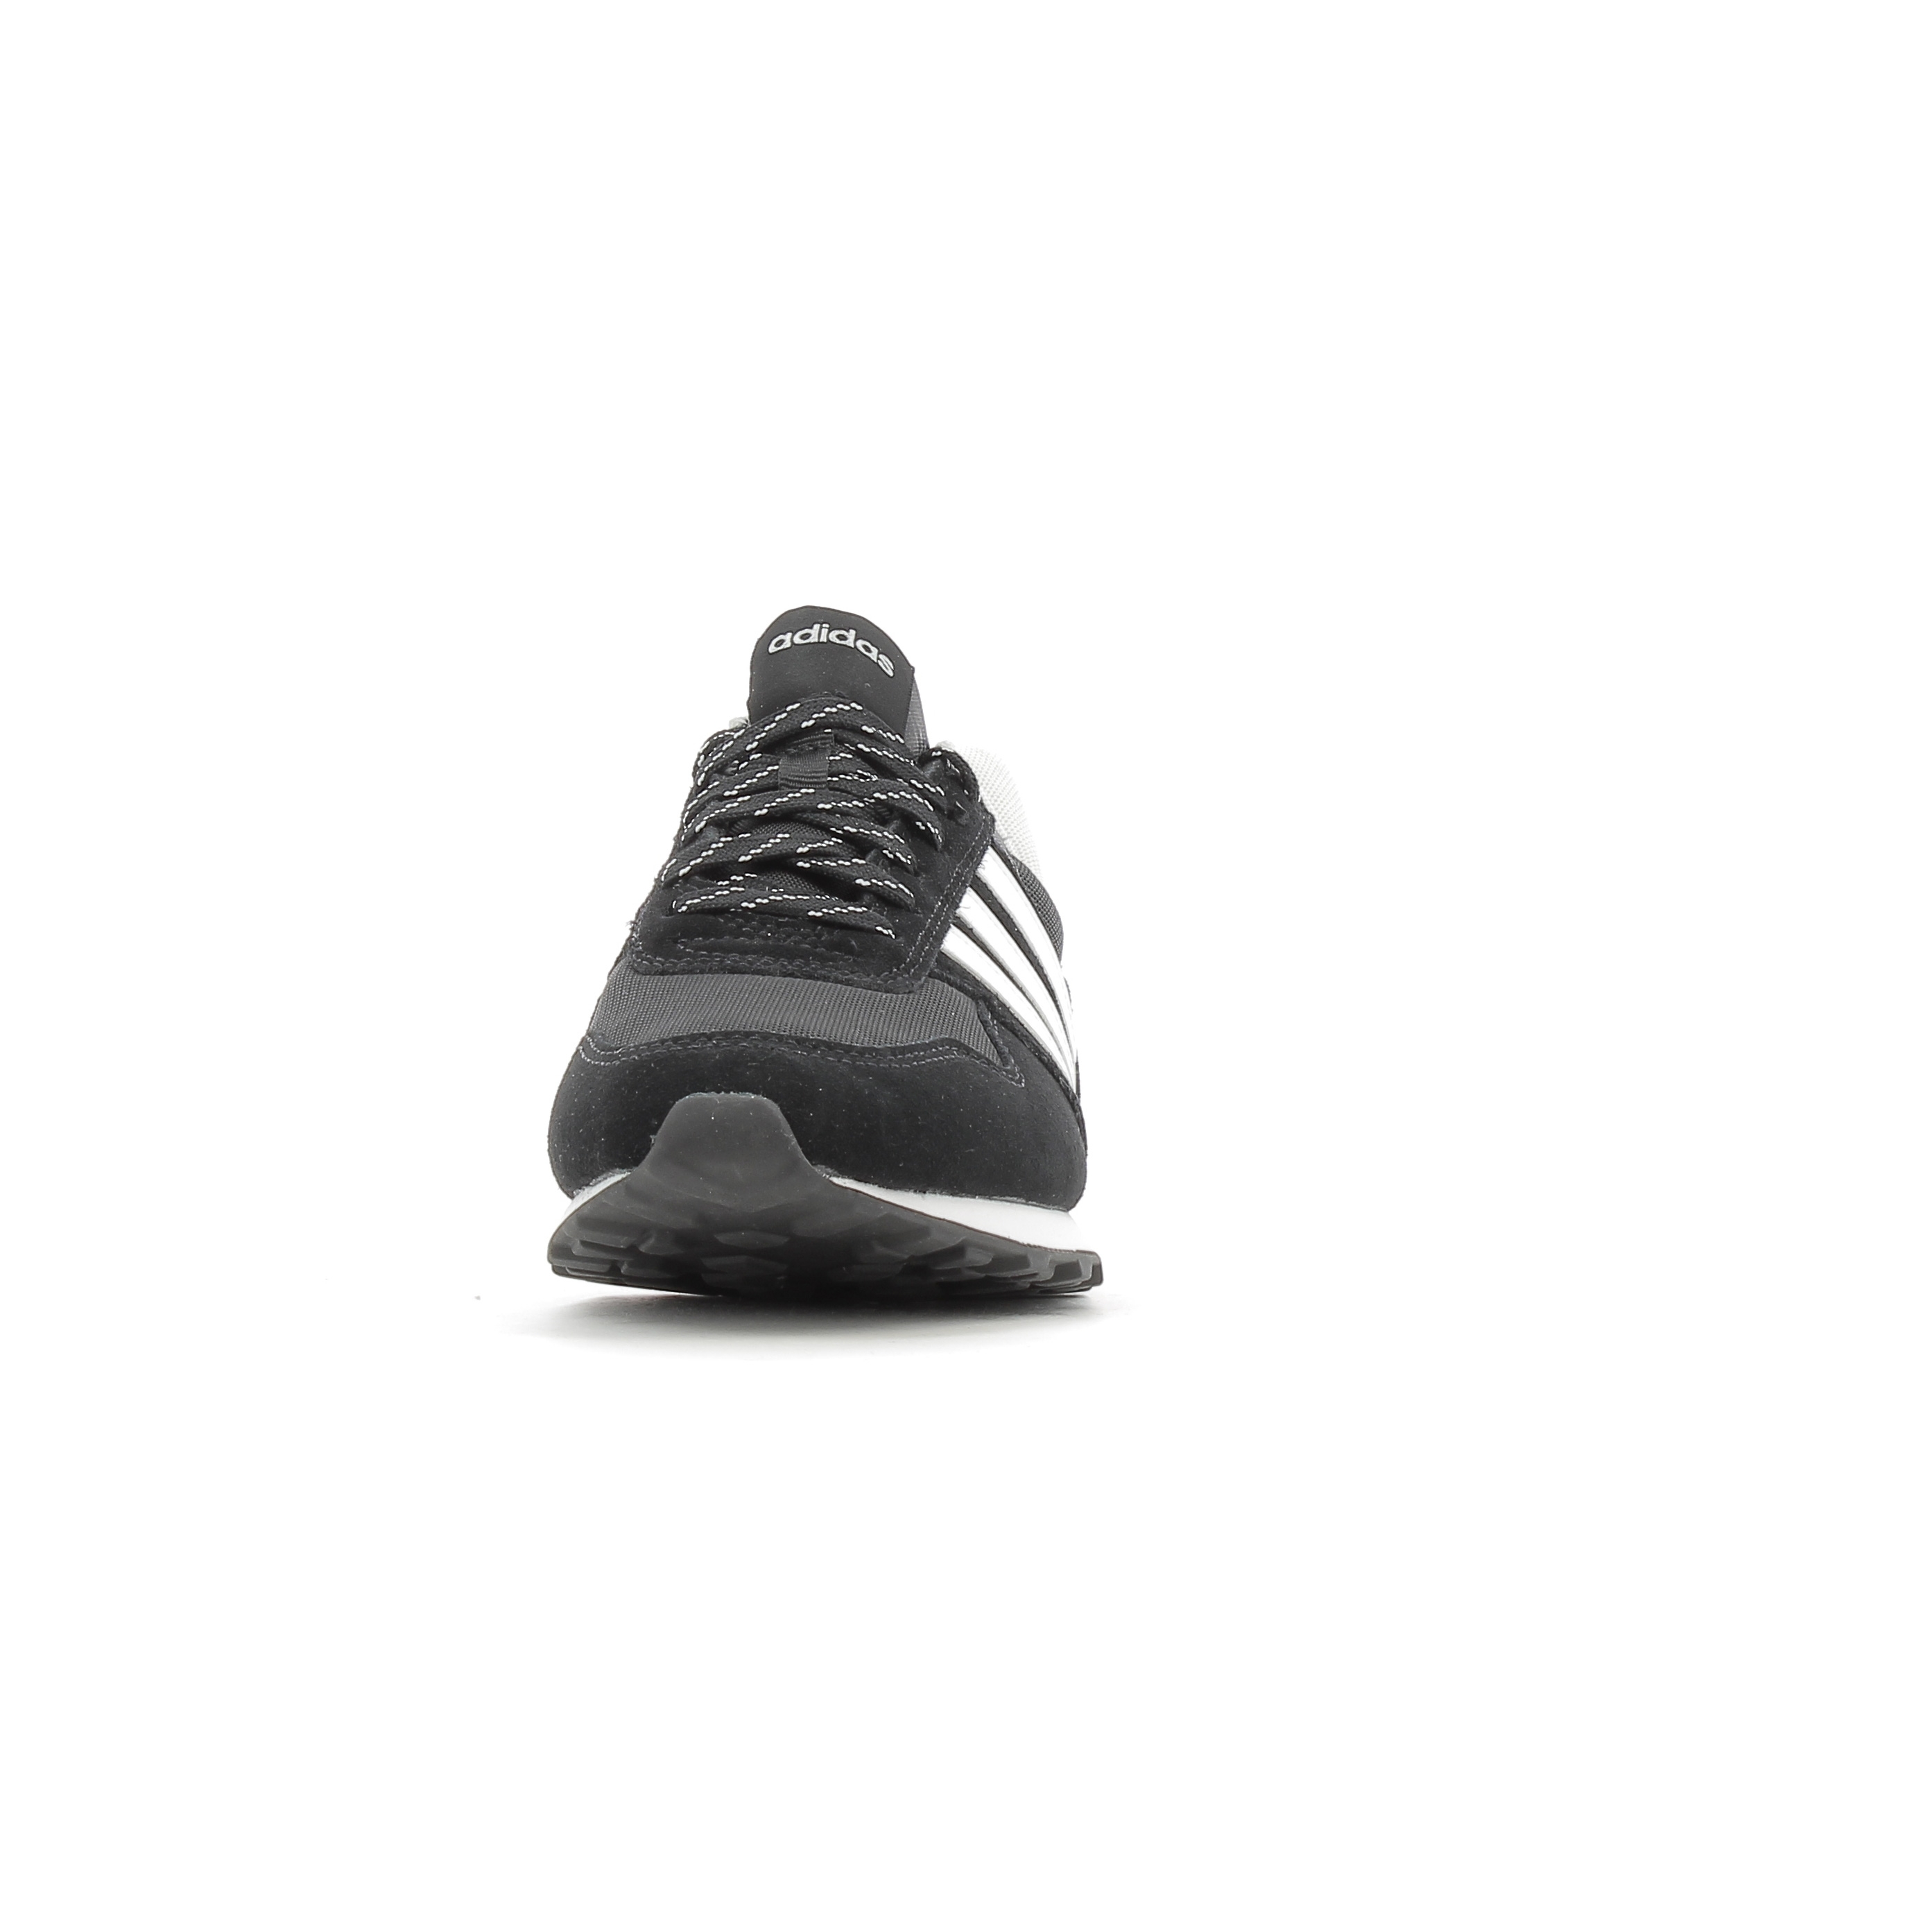 promo code 37f41 b1b4c Baskets basses Adidas Performance 10K W